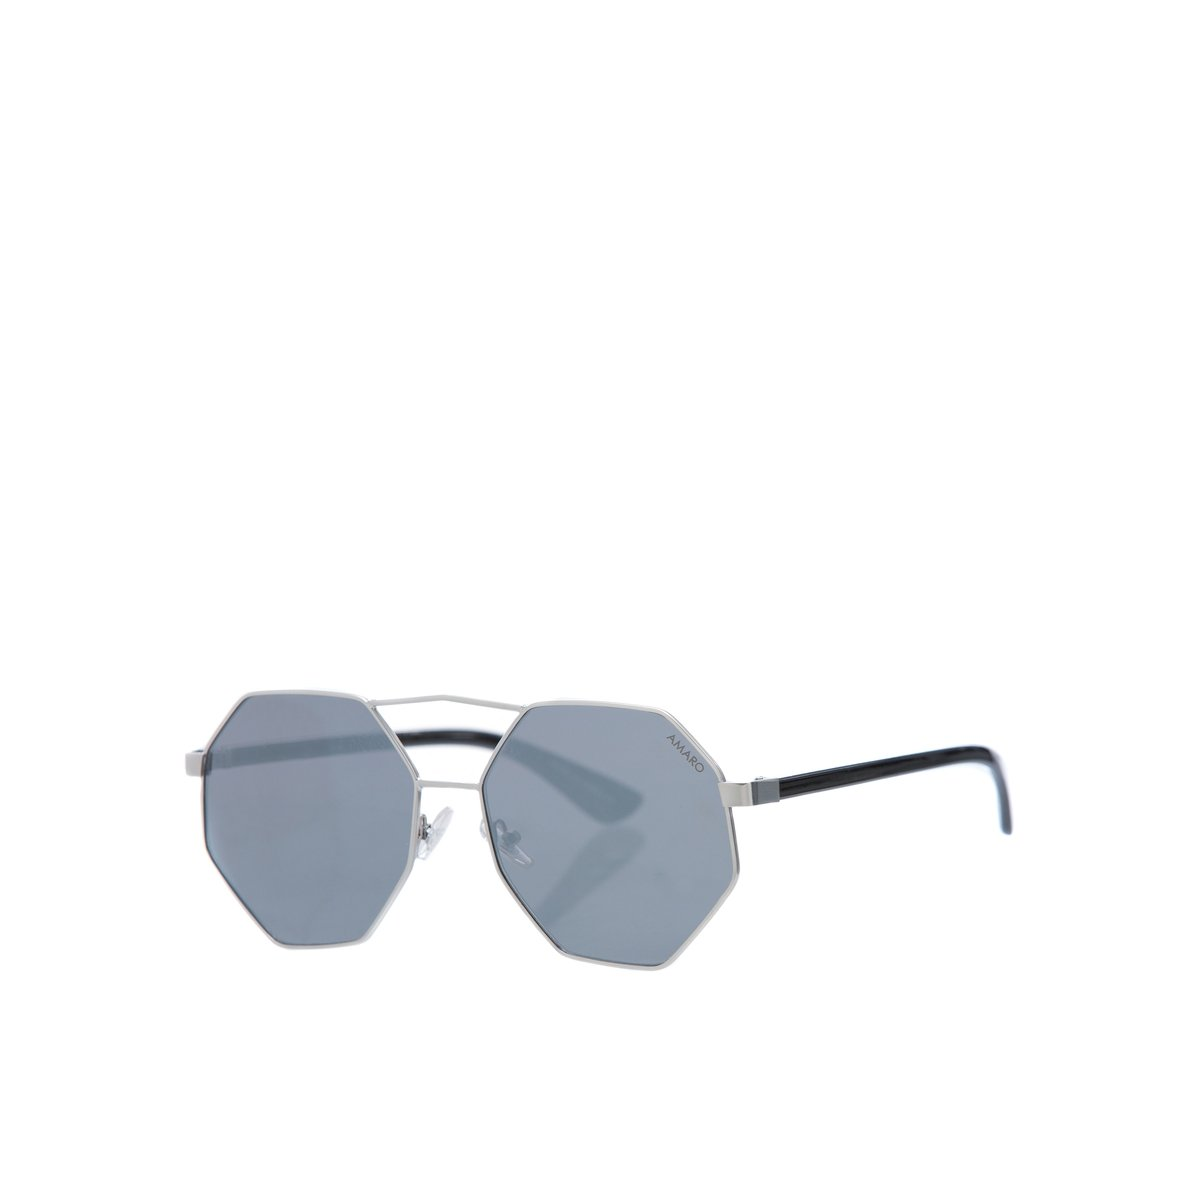 óculos Amaro De Sol Octagonal - Compre Agora   Zattini 1f1d0e4cab